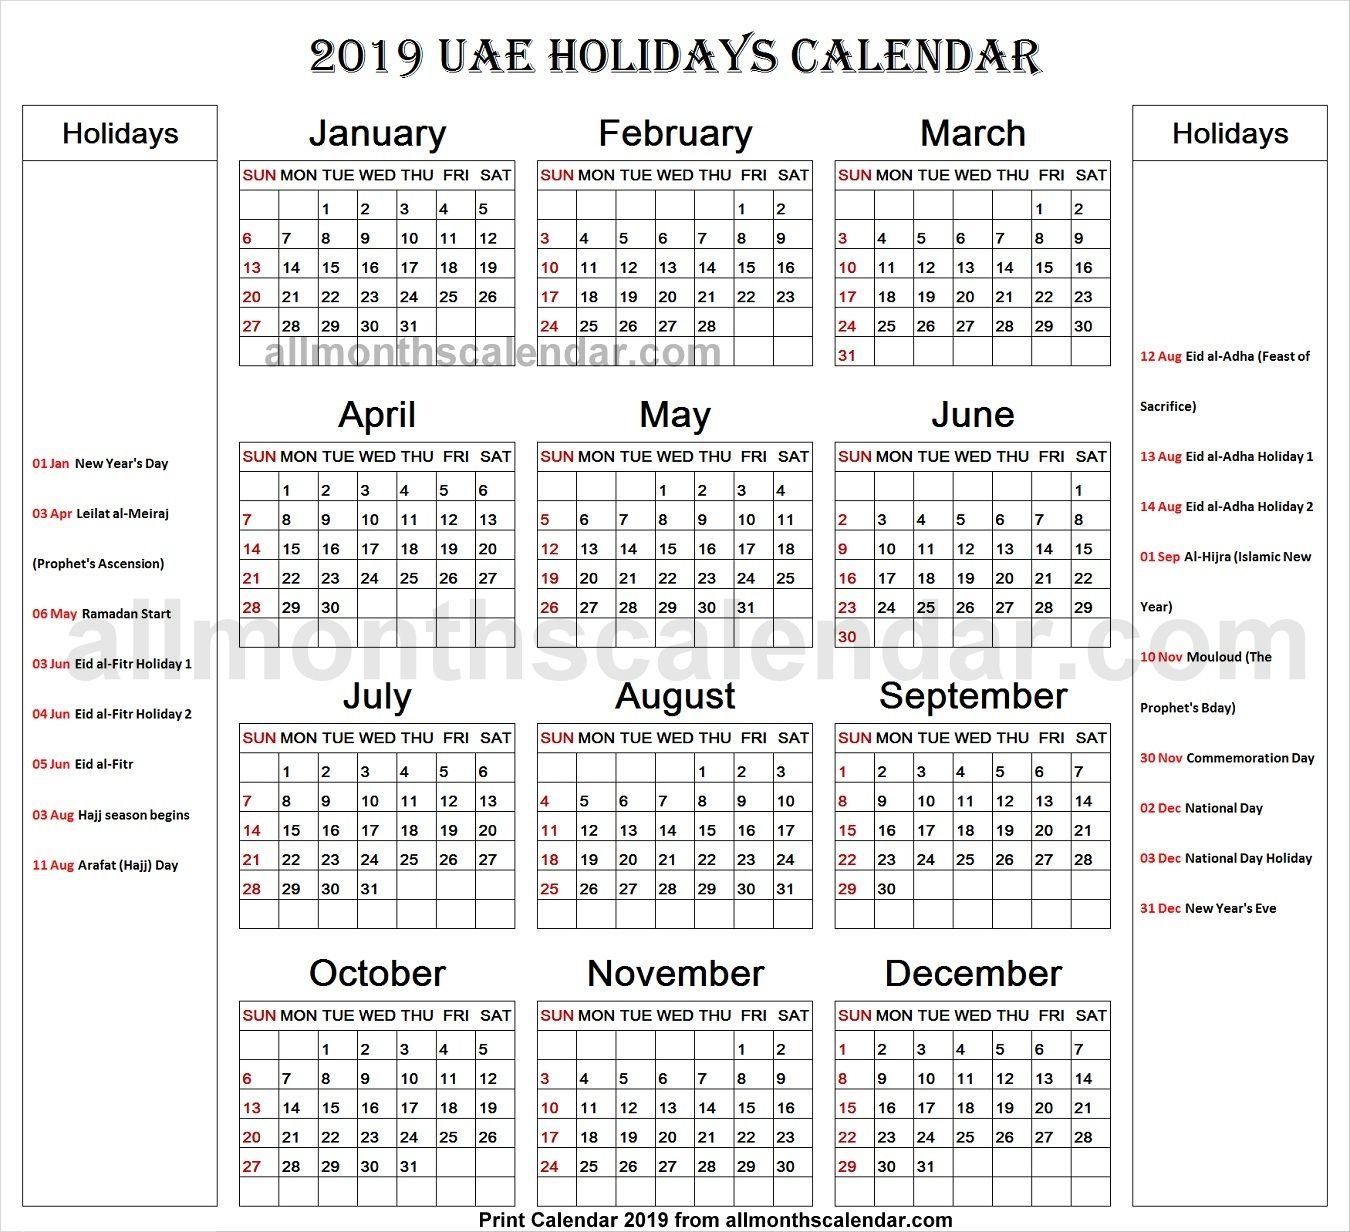 United Arab Emirates Holiday List 2019 Calendar Holiday List